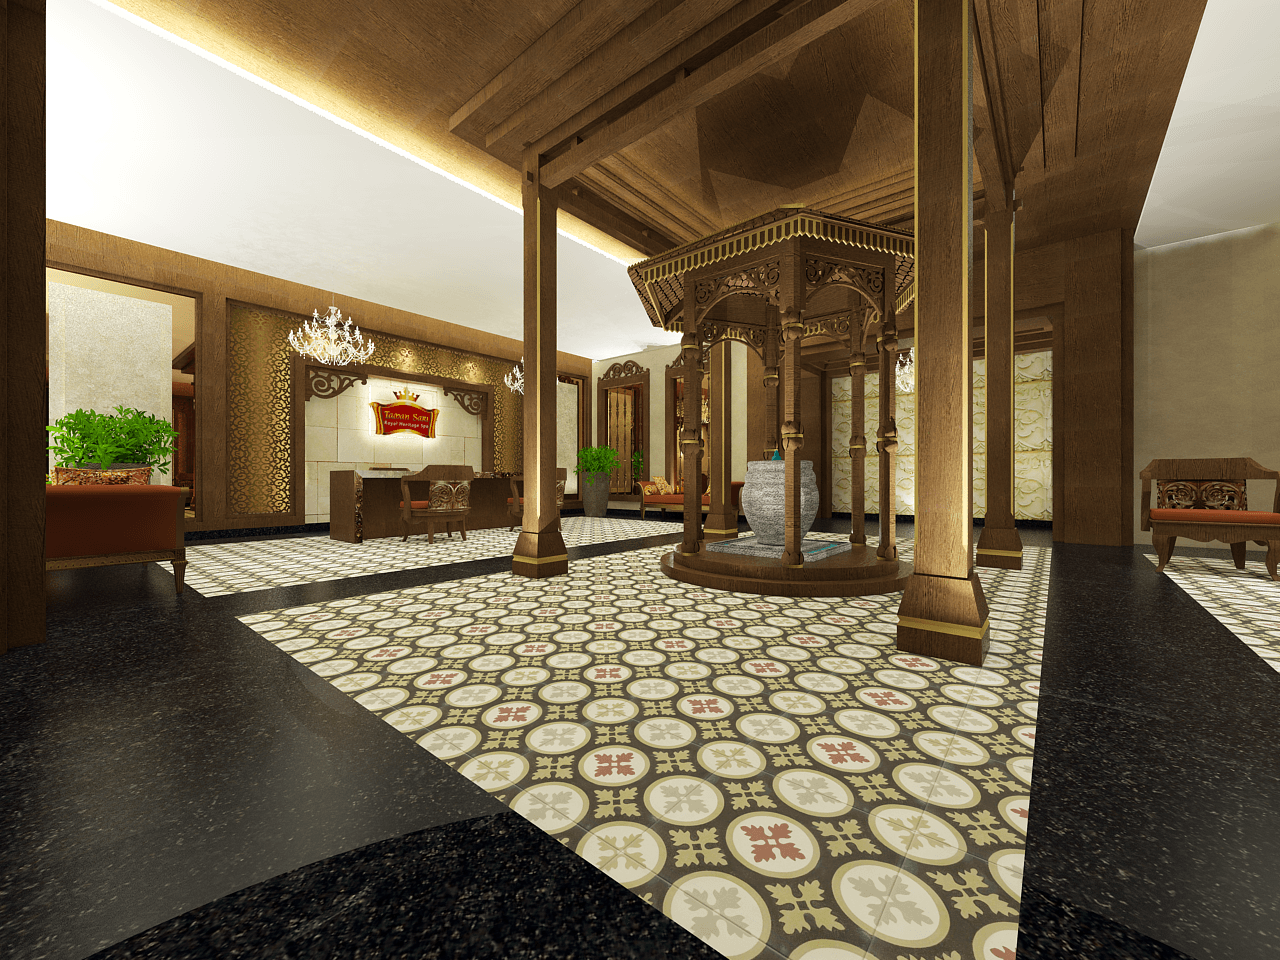 Tms Creative Taman Sari Royal Heritage Spa In Prague, Czech Republic Prague 1, Ceko Jakarta Lobby-2 Tradisional 12403